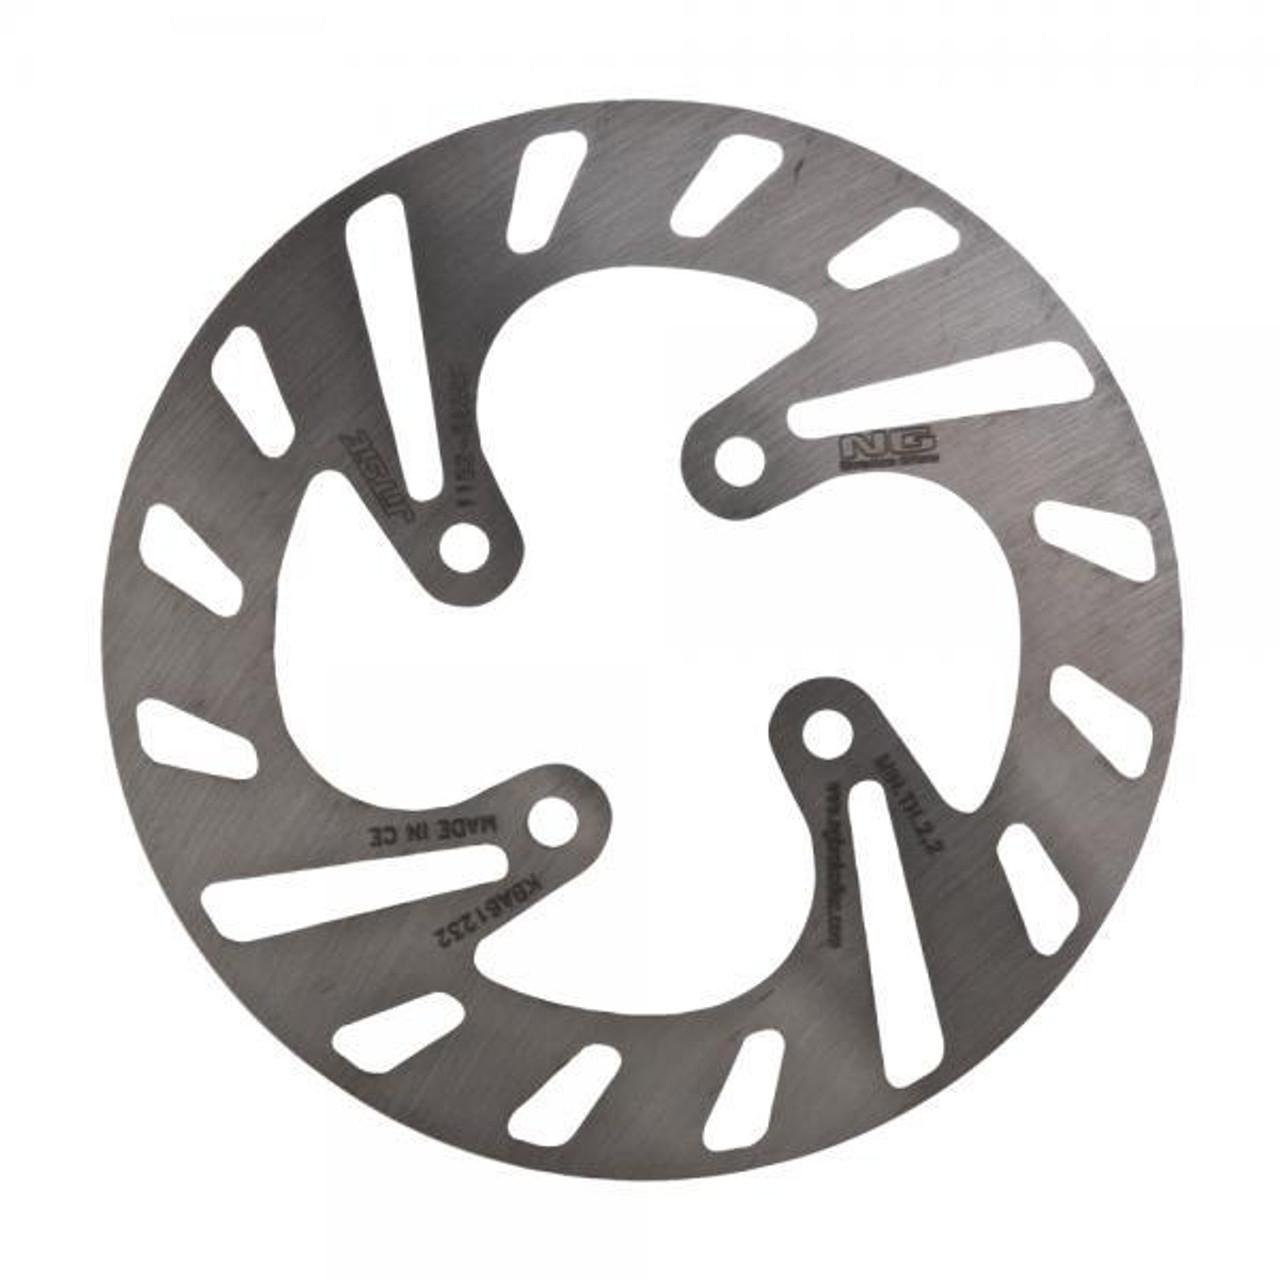 NG rear brake disc BDRR 1152